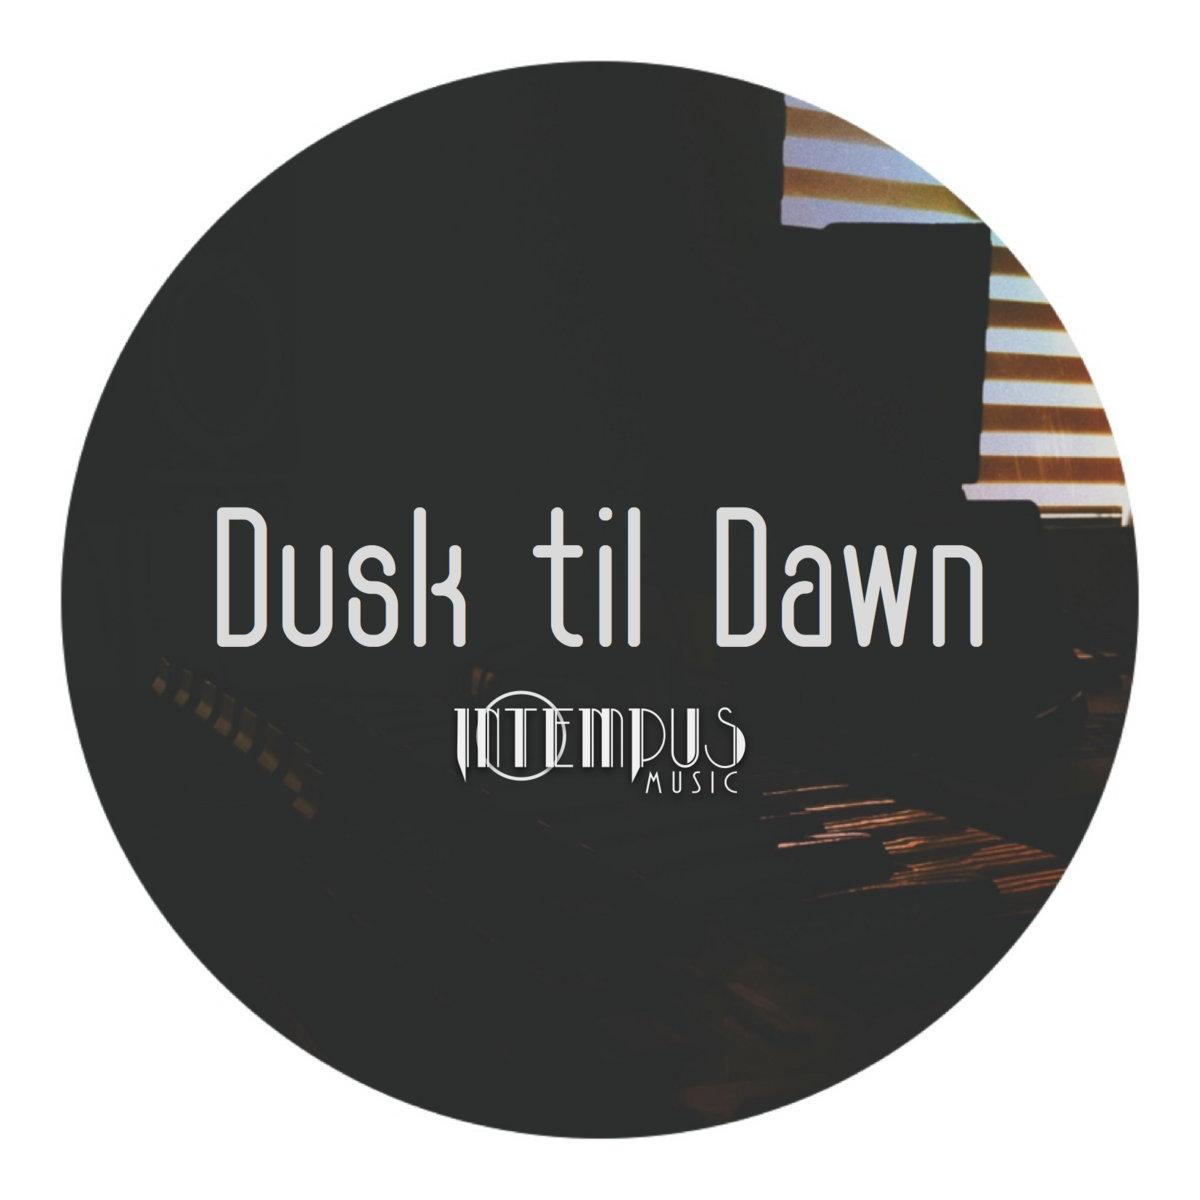 Dusk til Dawn (Single) by Intempus